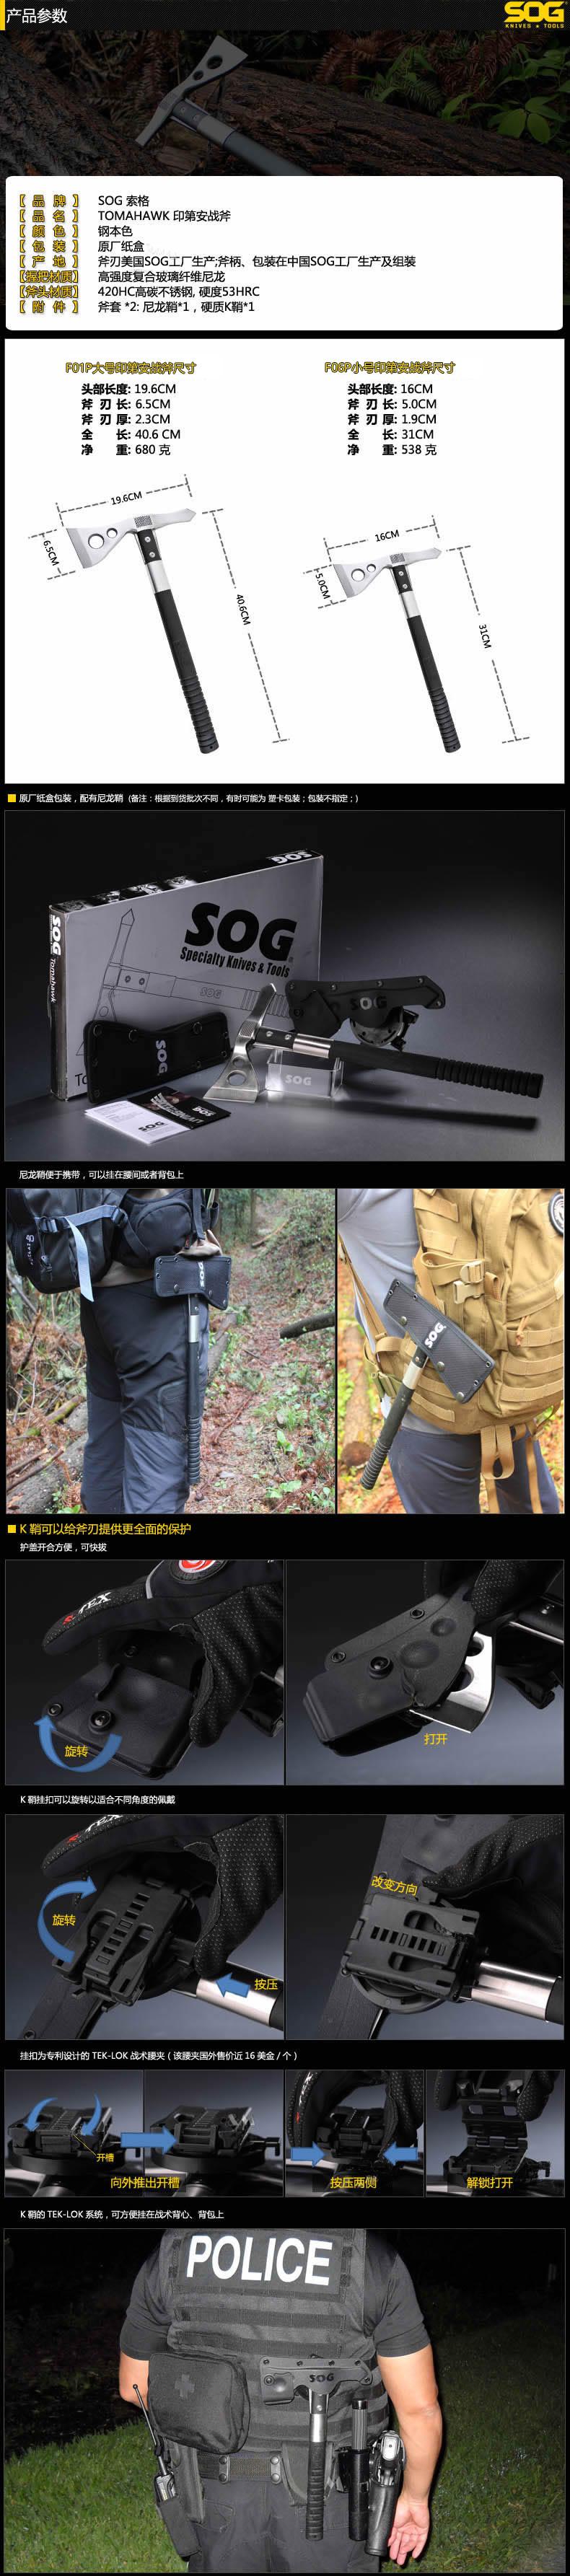 sog f01p/f06p 印第安野营斧 战斧 工具斧